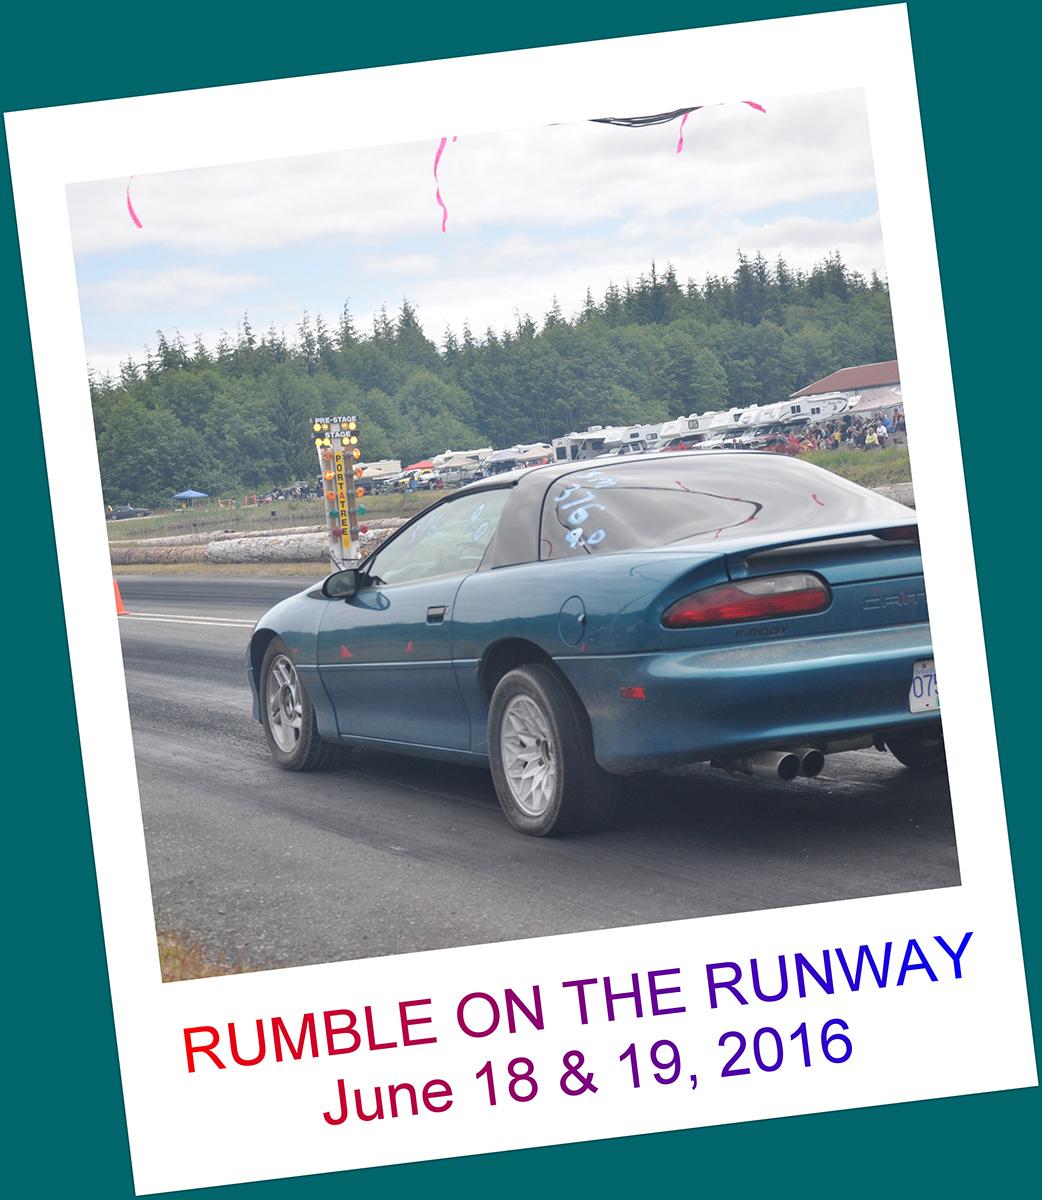 Rumble on the Runway June 18 & 19, 2016 547